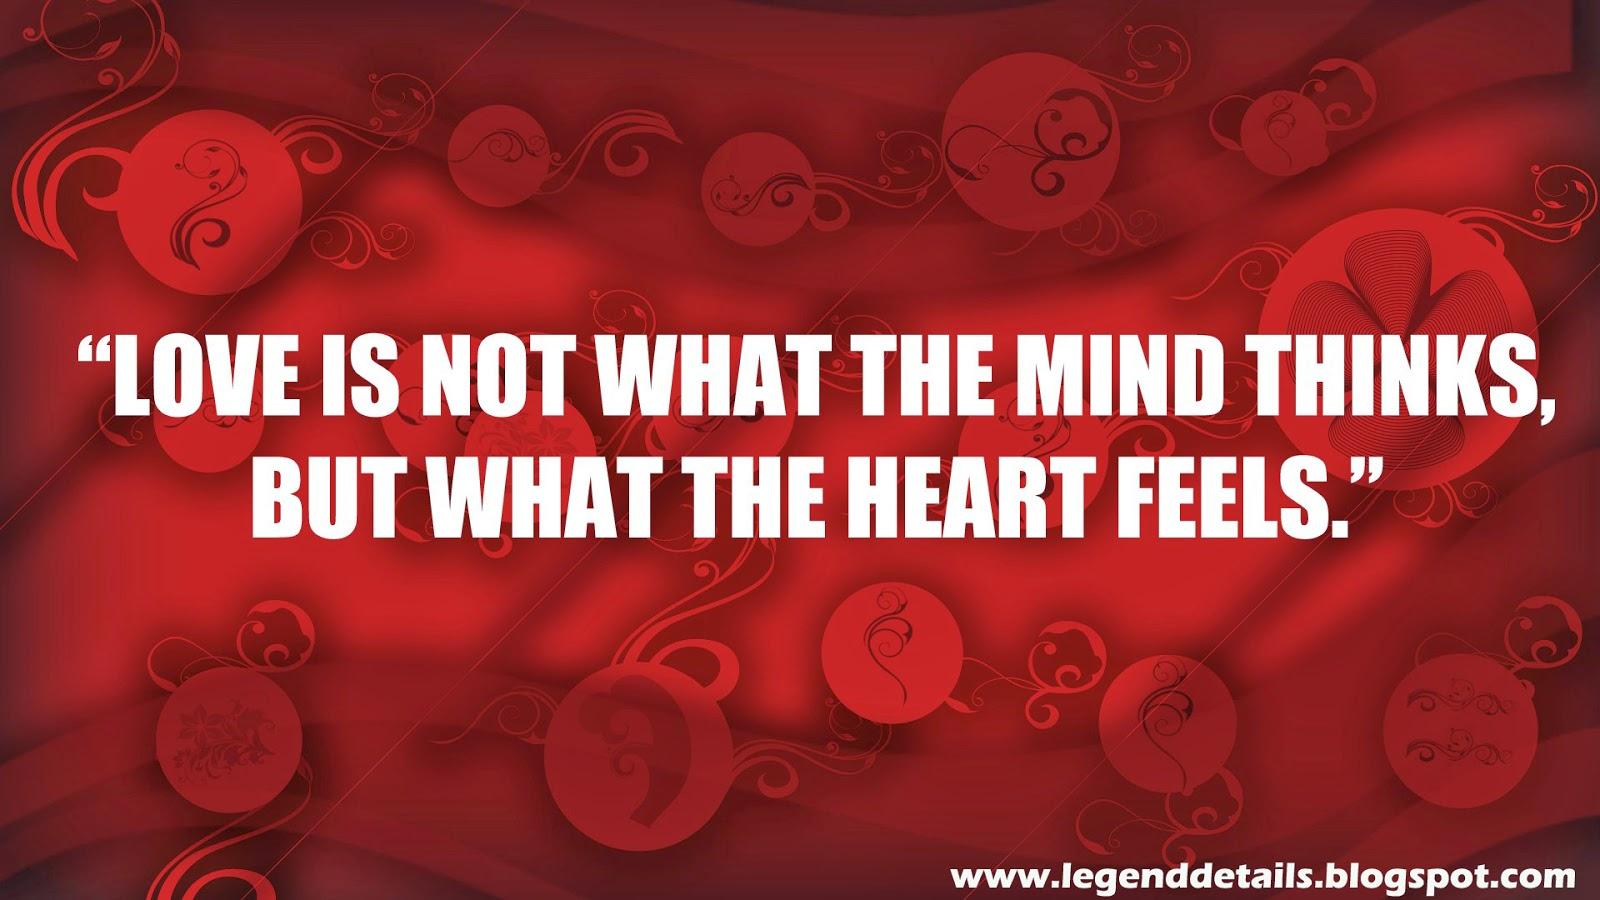 True Love Quotes Wallpaper: Legendary Quotes